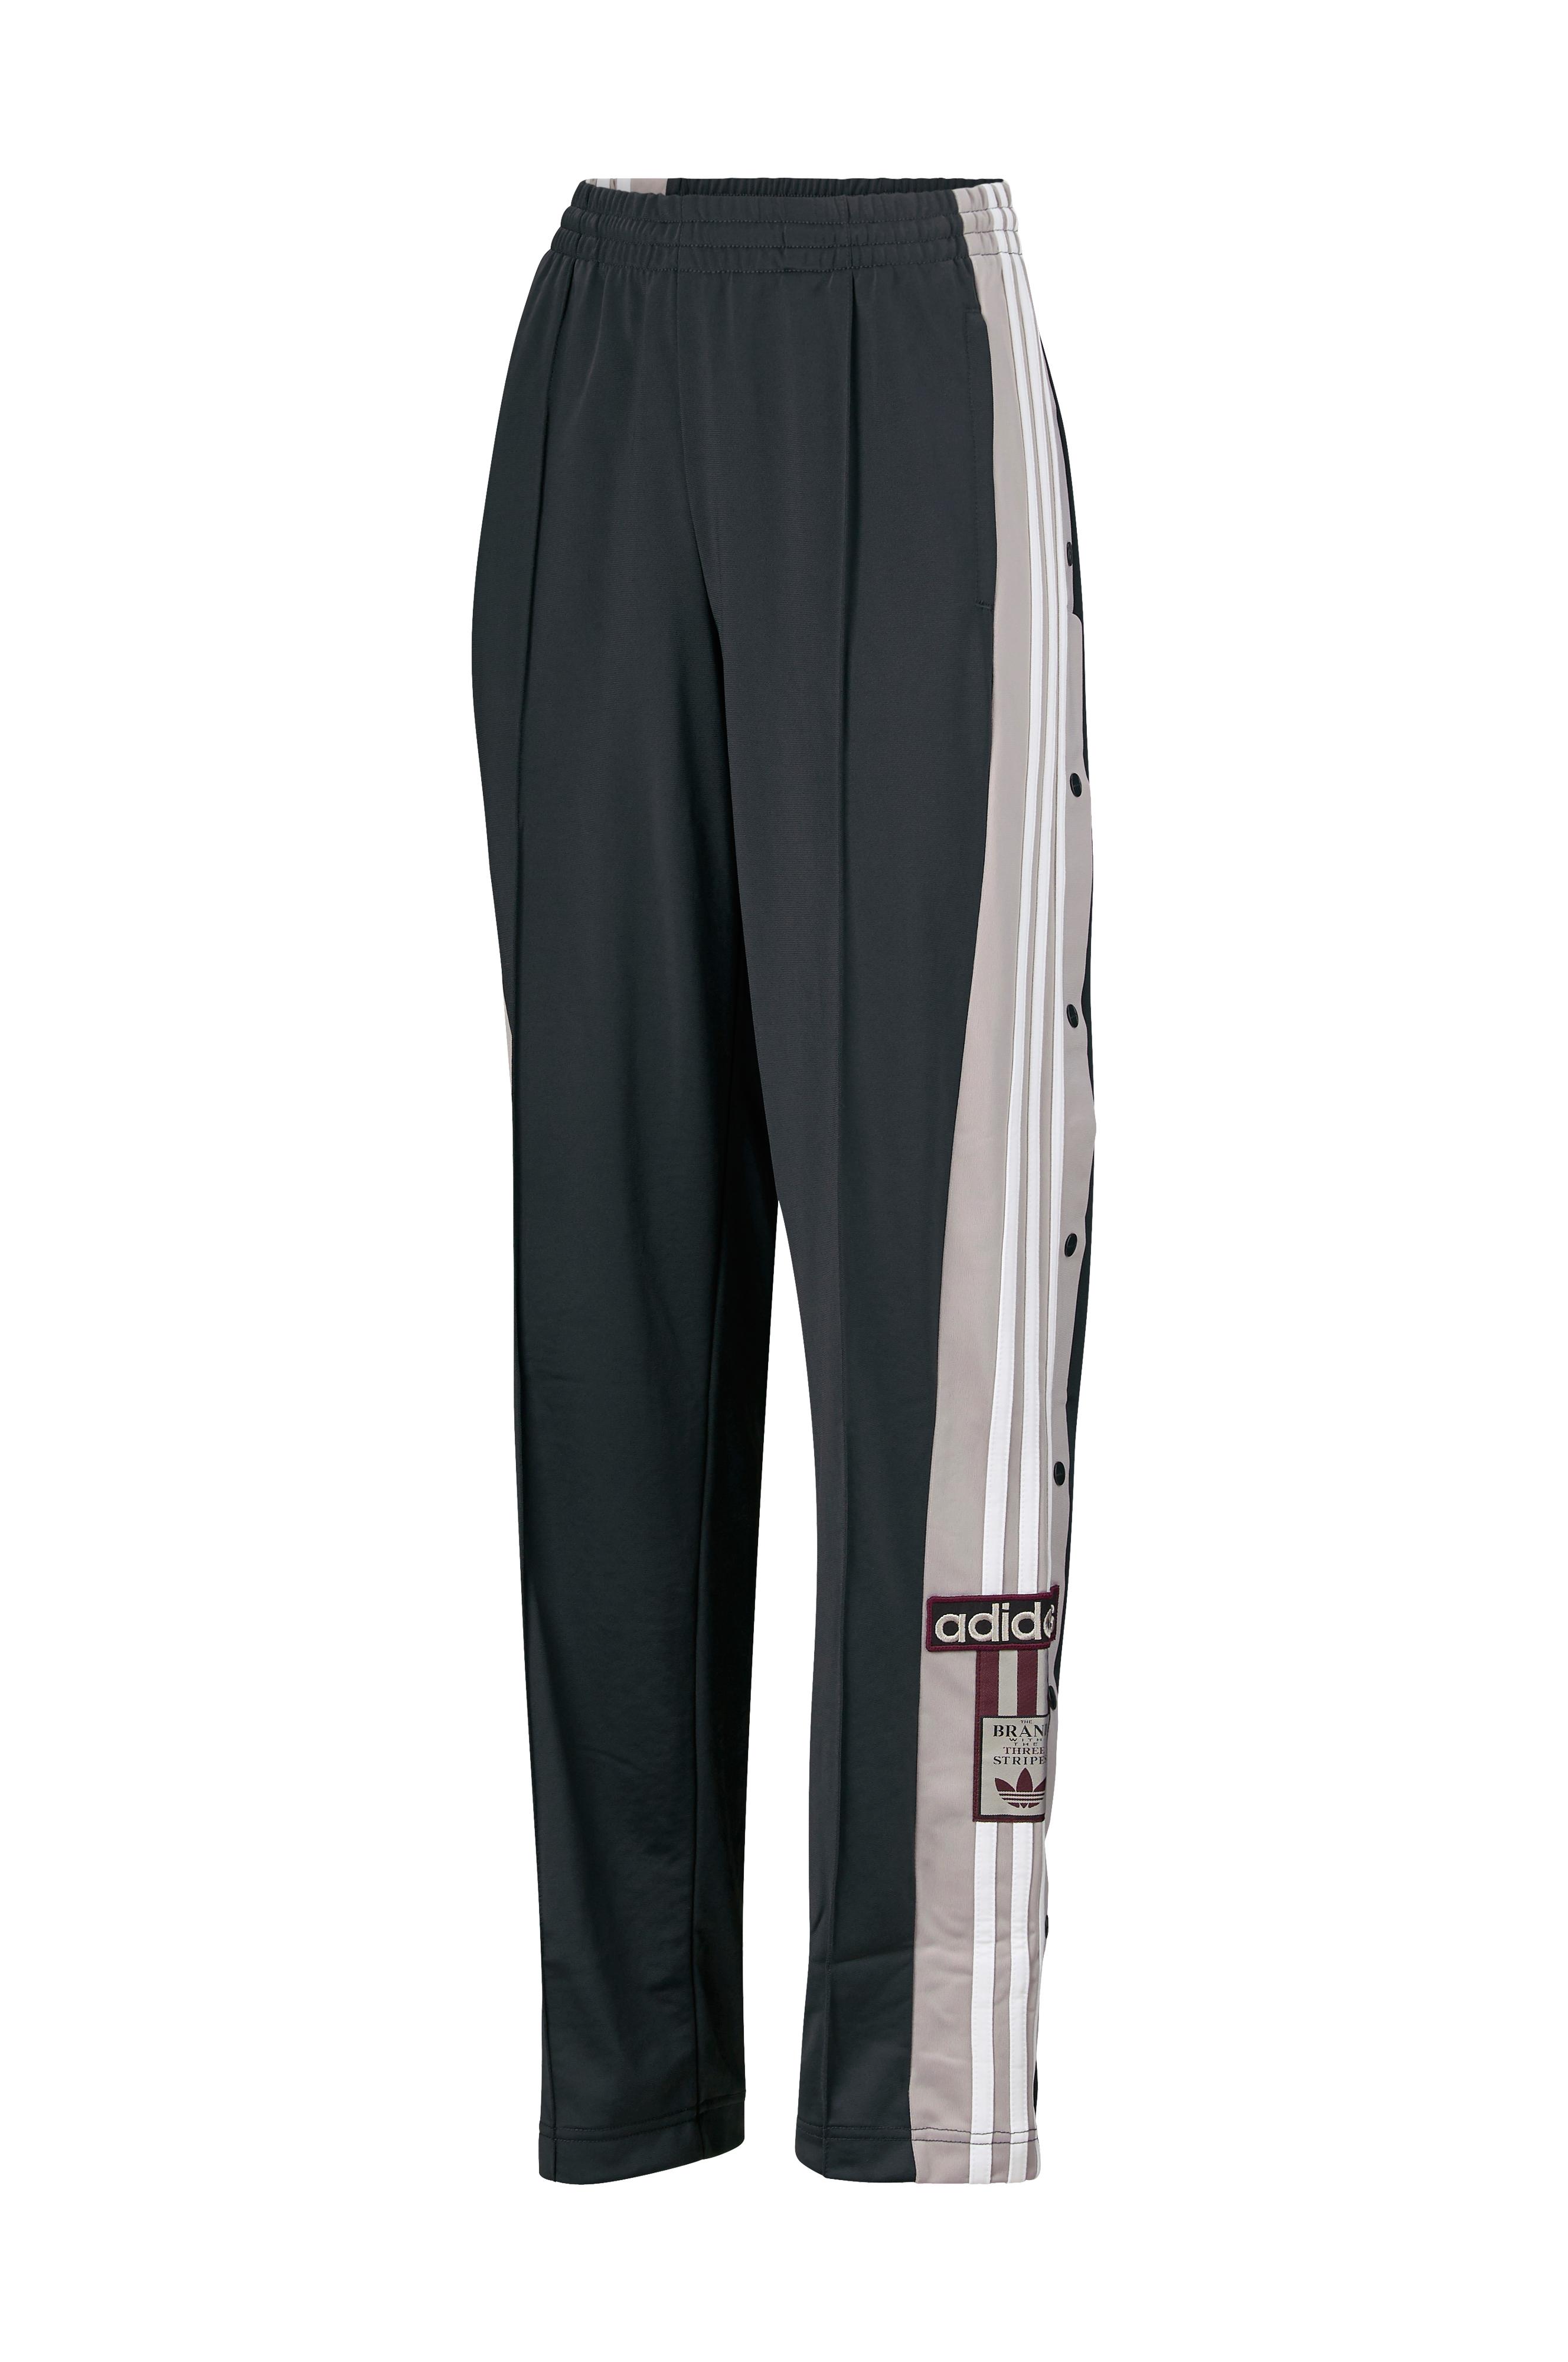 adidas Originals Træningsbuks Adibreak Track Pants Sort